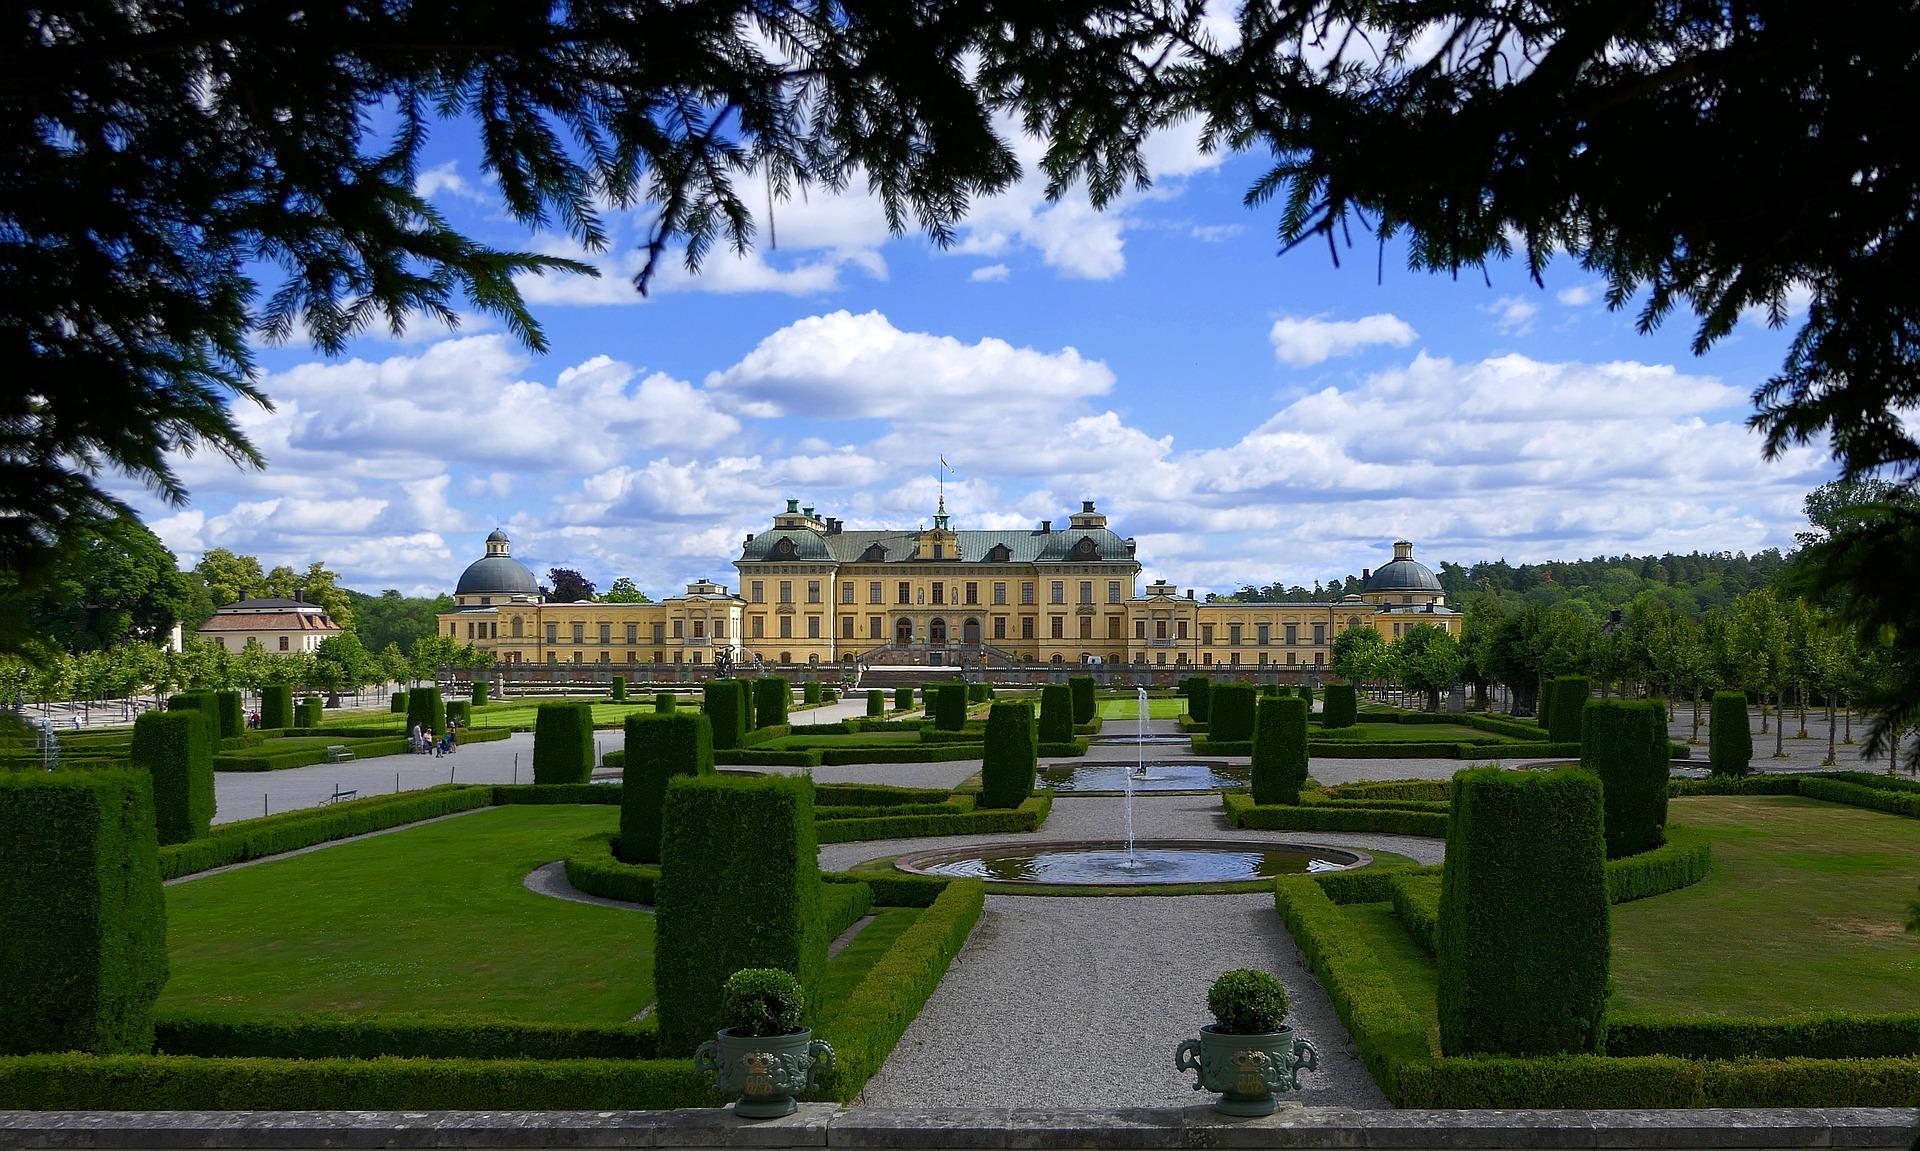 Landvetter Parkering | Sweden's most visited places by tourists